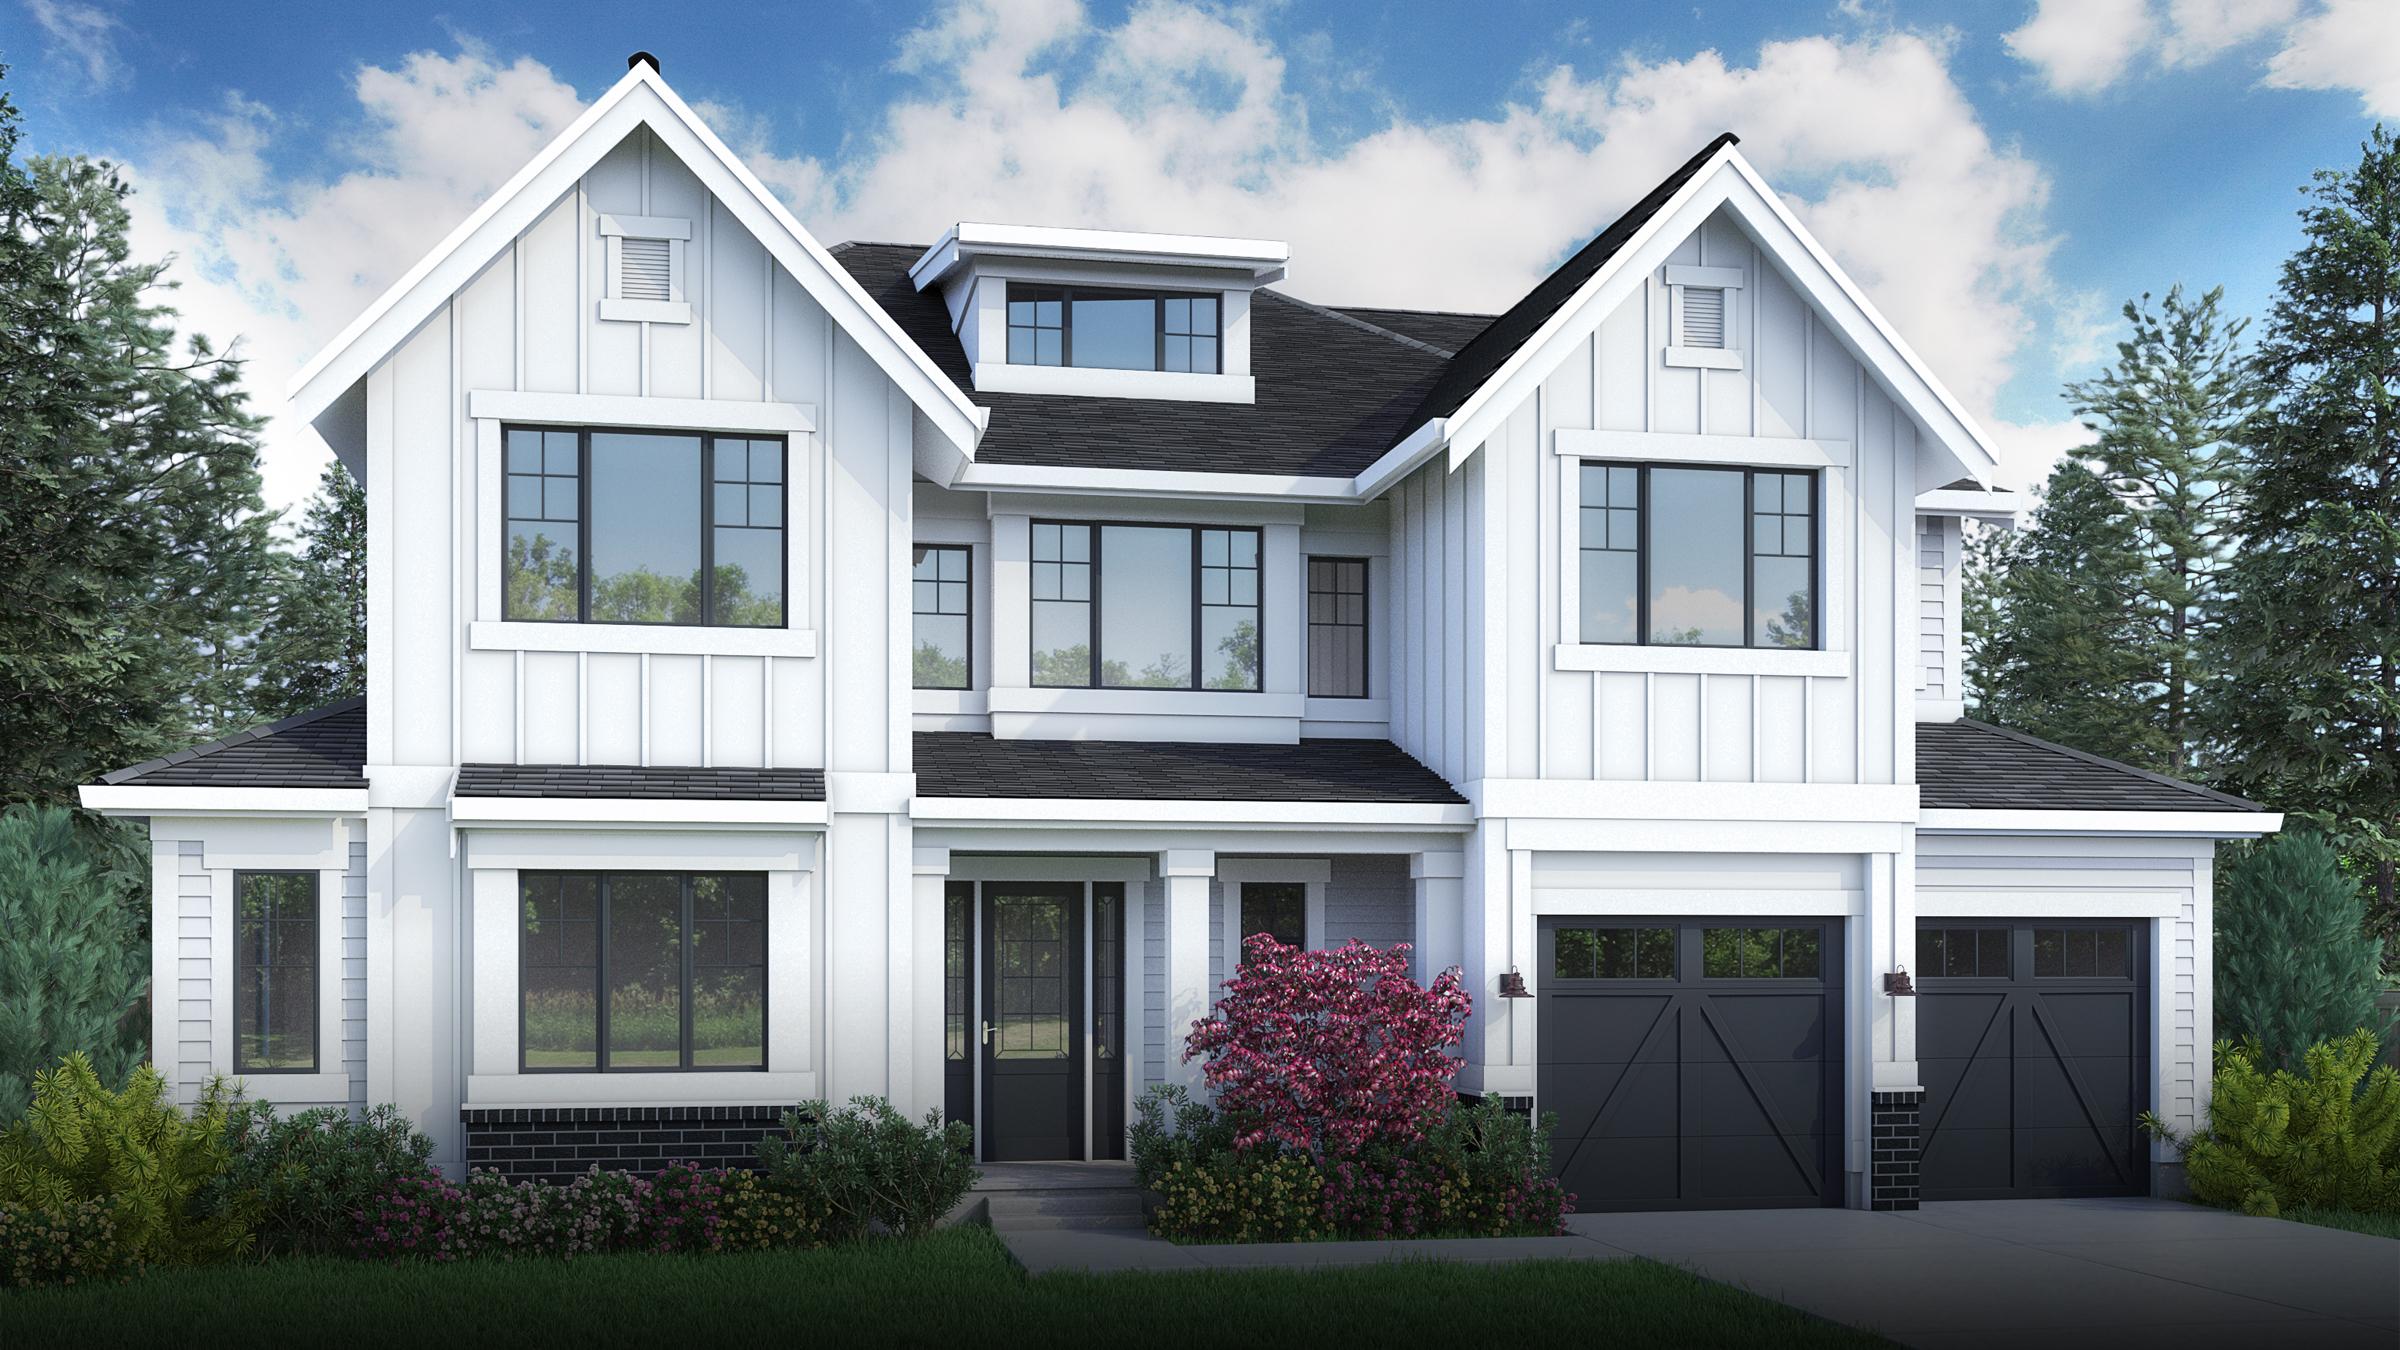 1611 105th Avenue SE   Bellevue 5 Beds, 5 Baths, 4,999 SF   Enatai